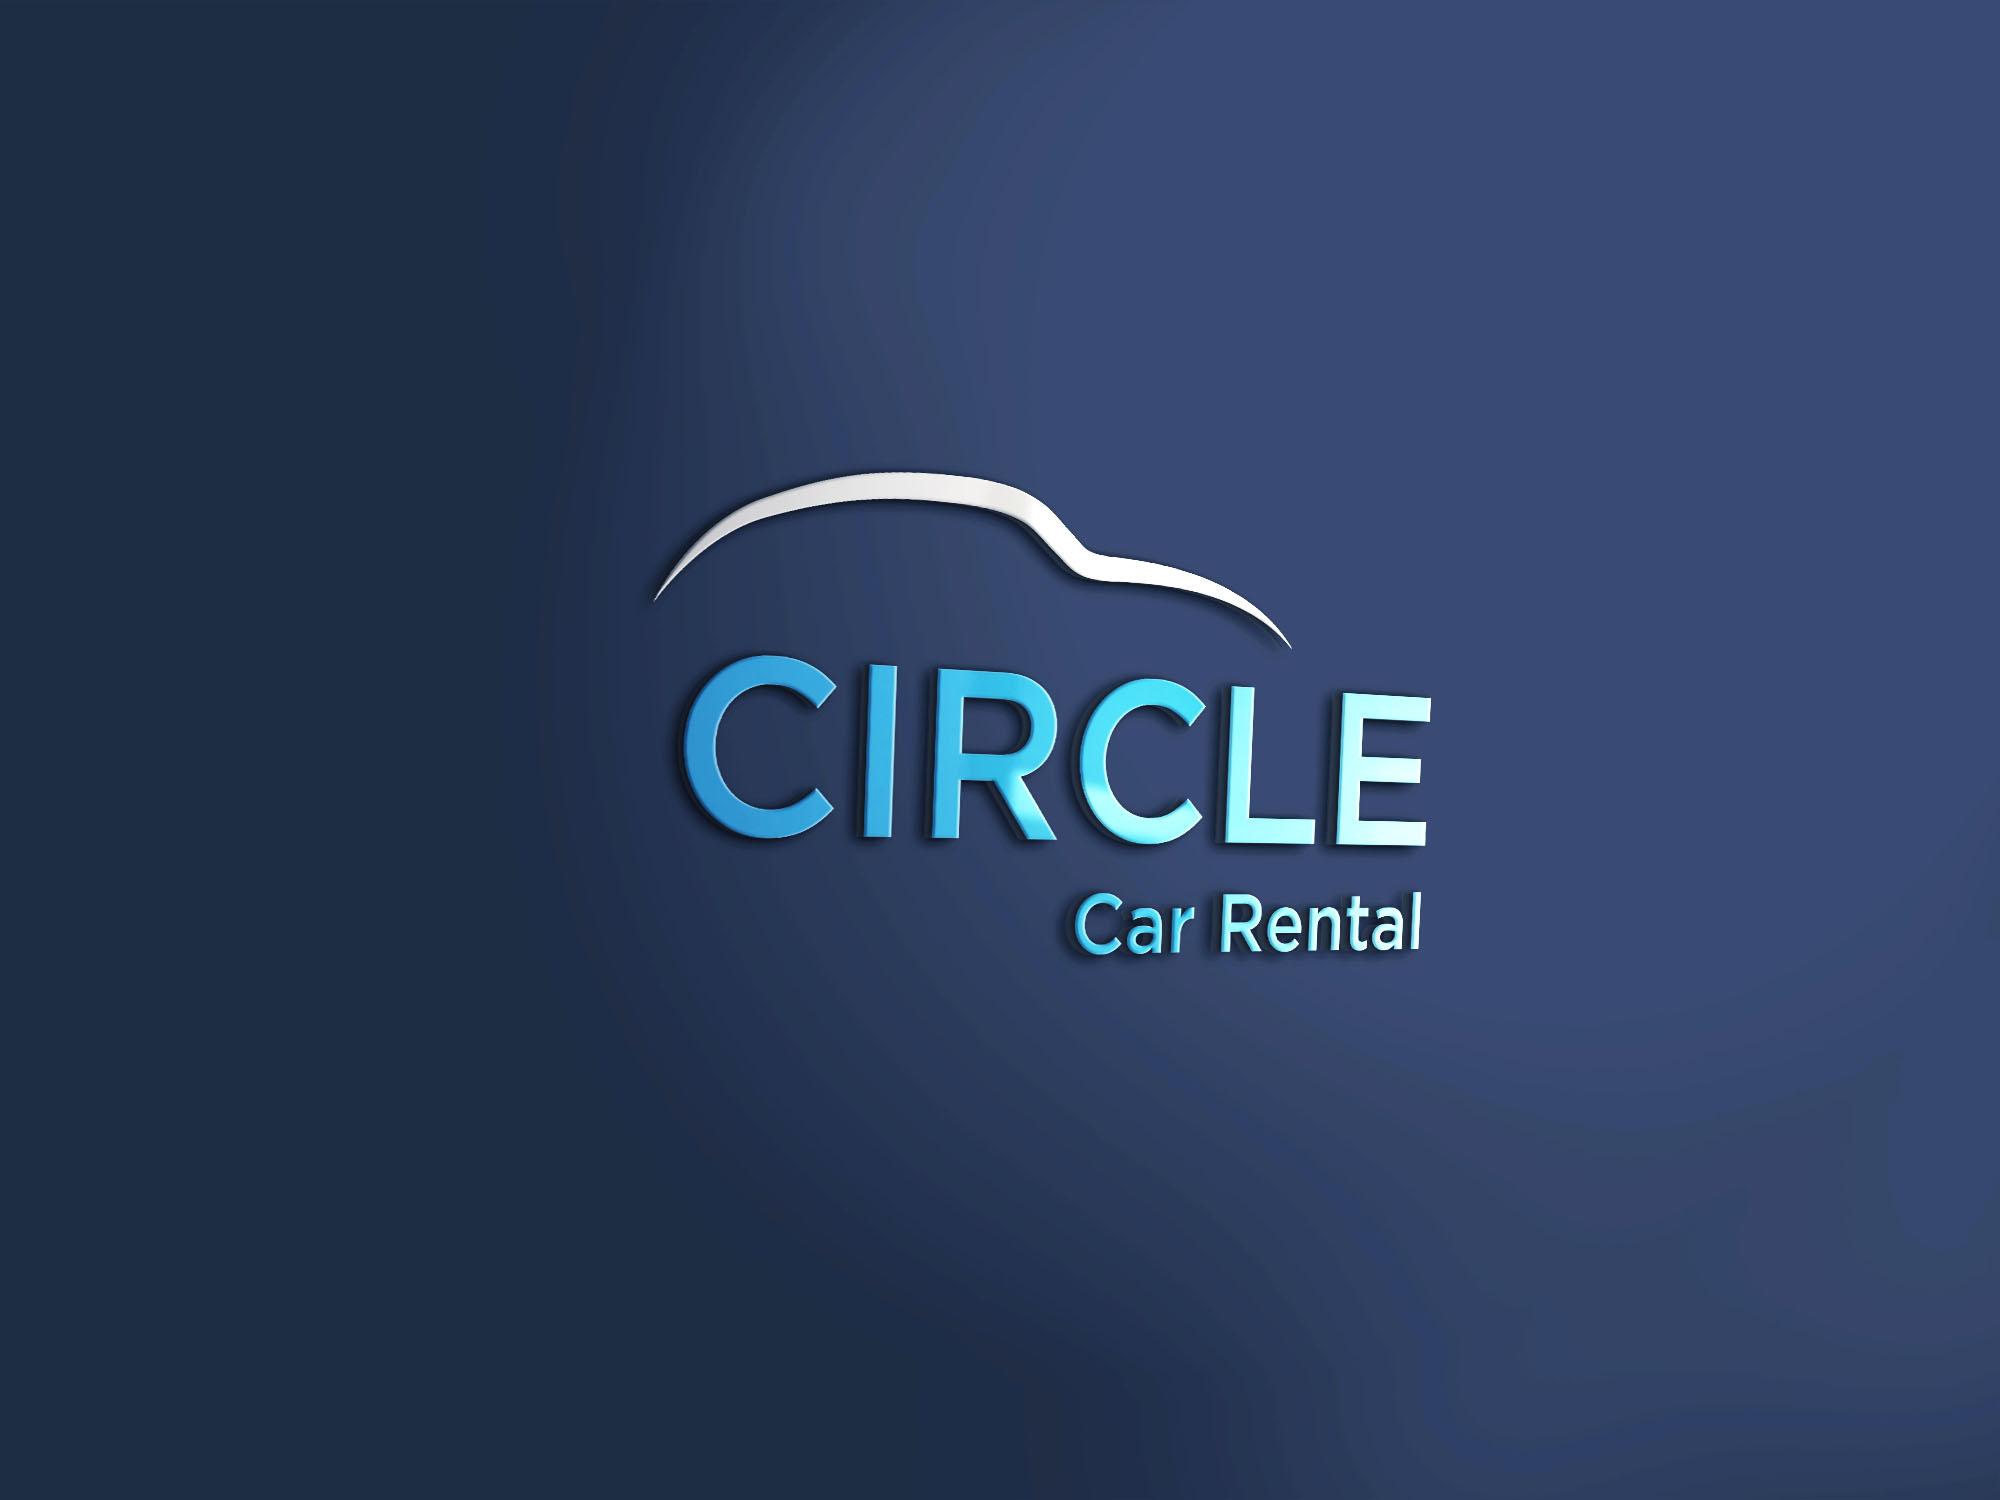 Circle Car Rental 3d Mockup2